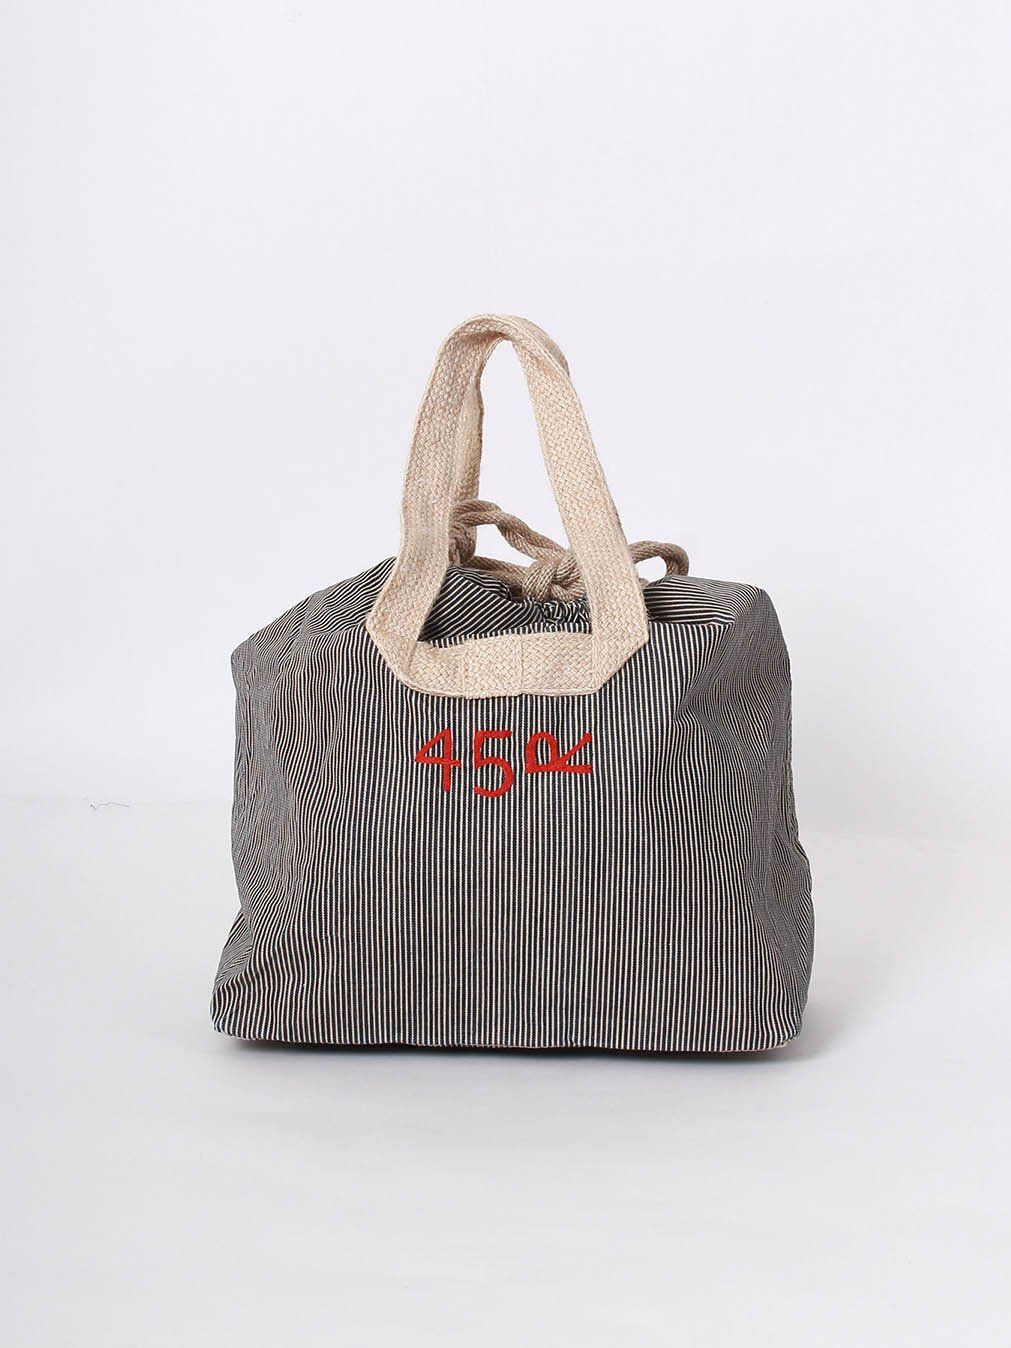 Hickory Laundry Tote Bag Small 45r Usa Laundry Tote Bag Laundry Tote Bags